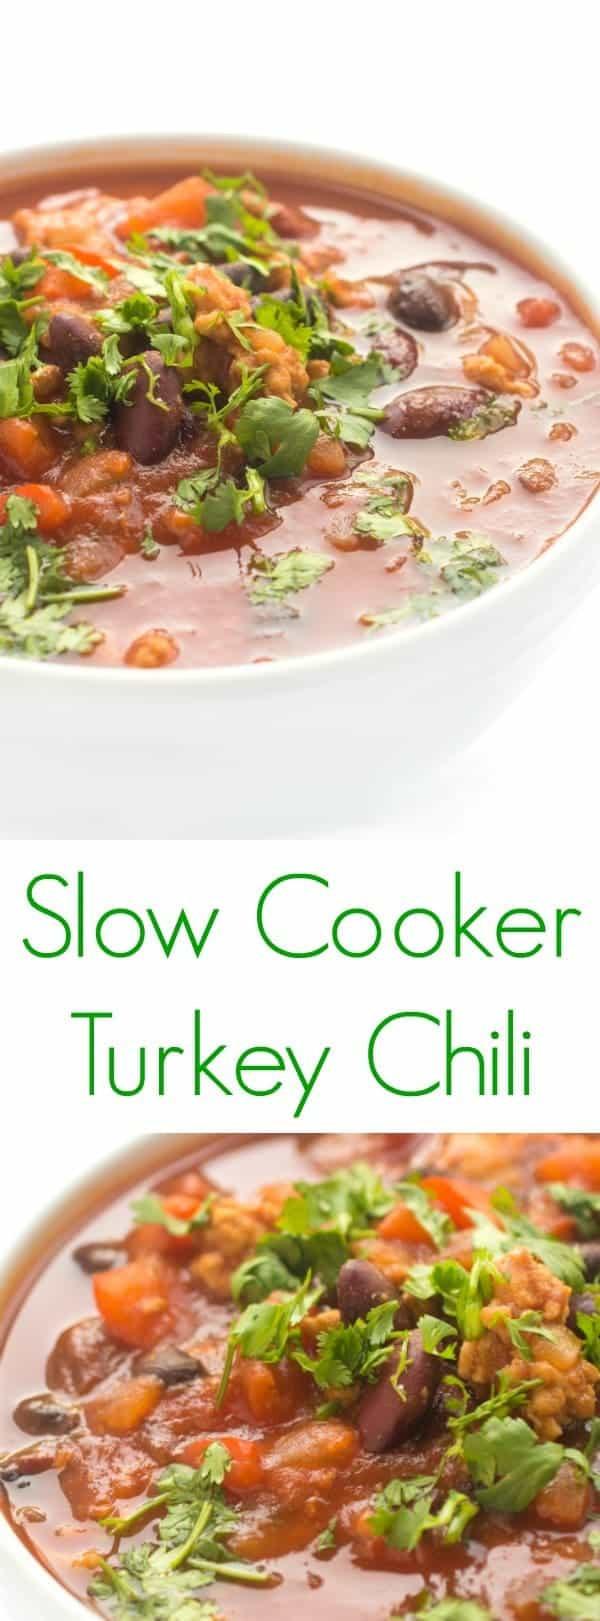 Healthy Turkey Chili Recipe Slow Cooker  Crock Pot Slow Cooker Turkey Chili The Lemon Bowl